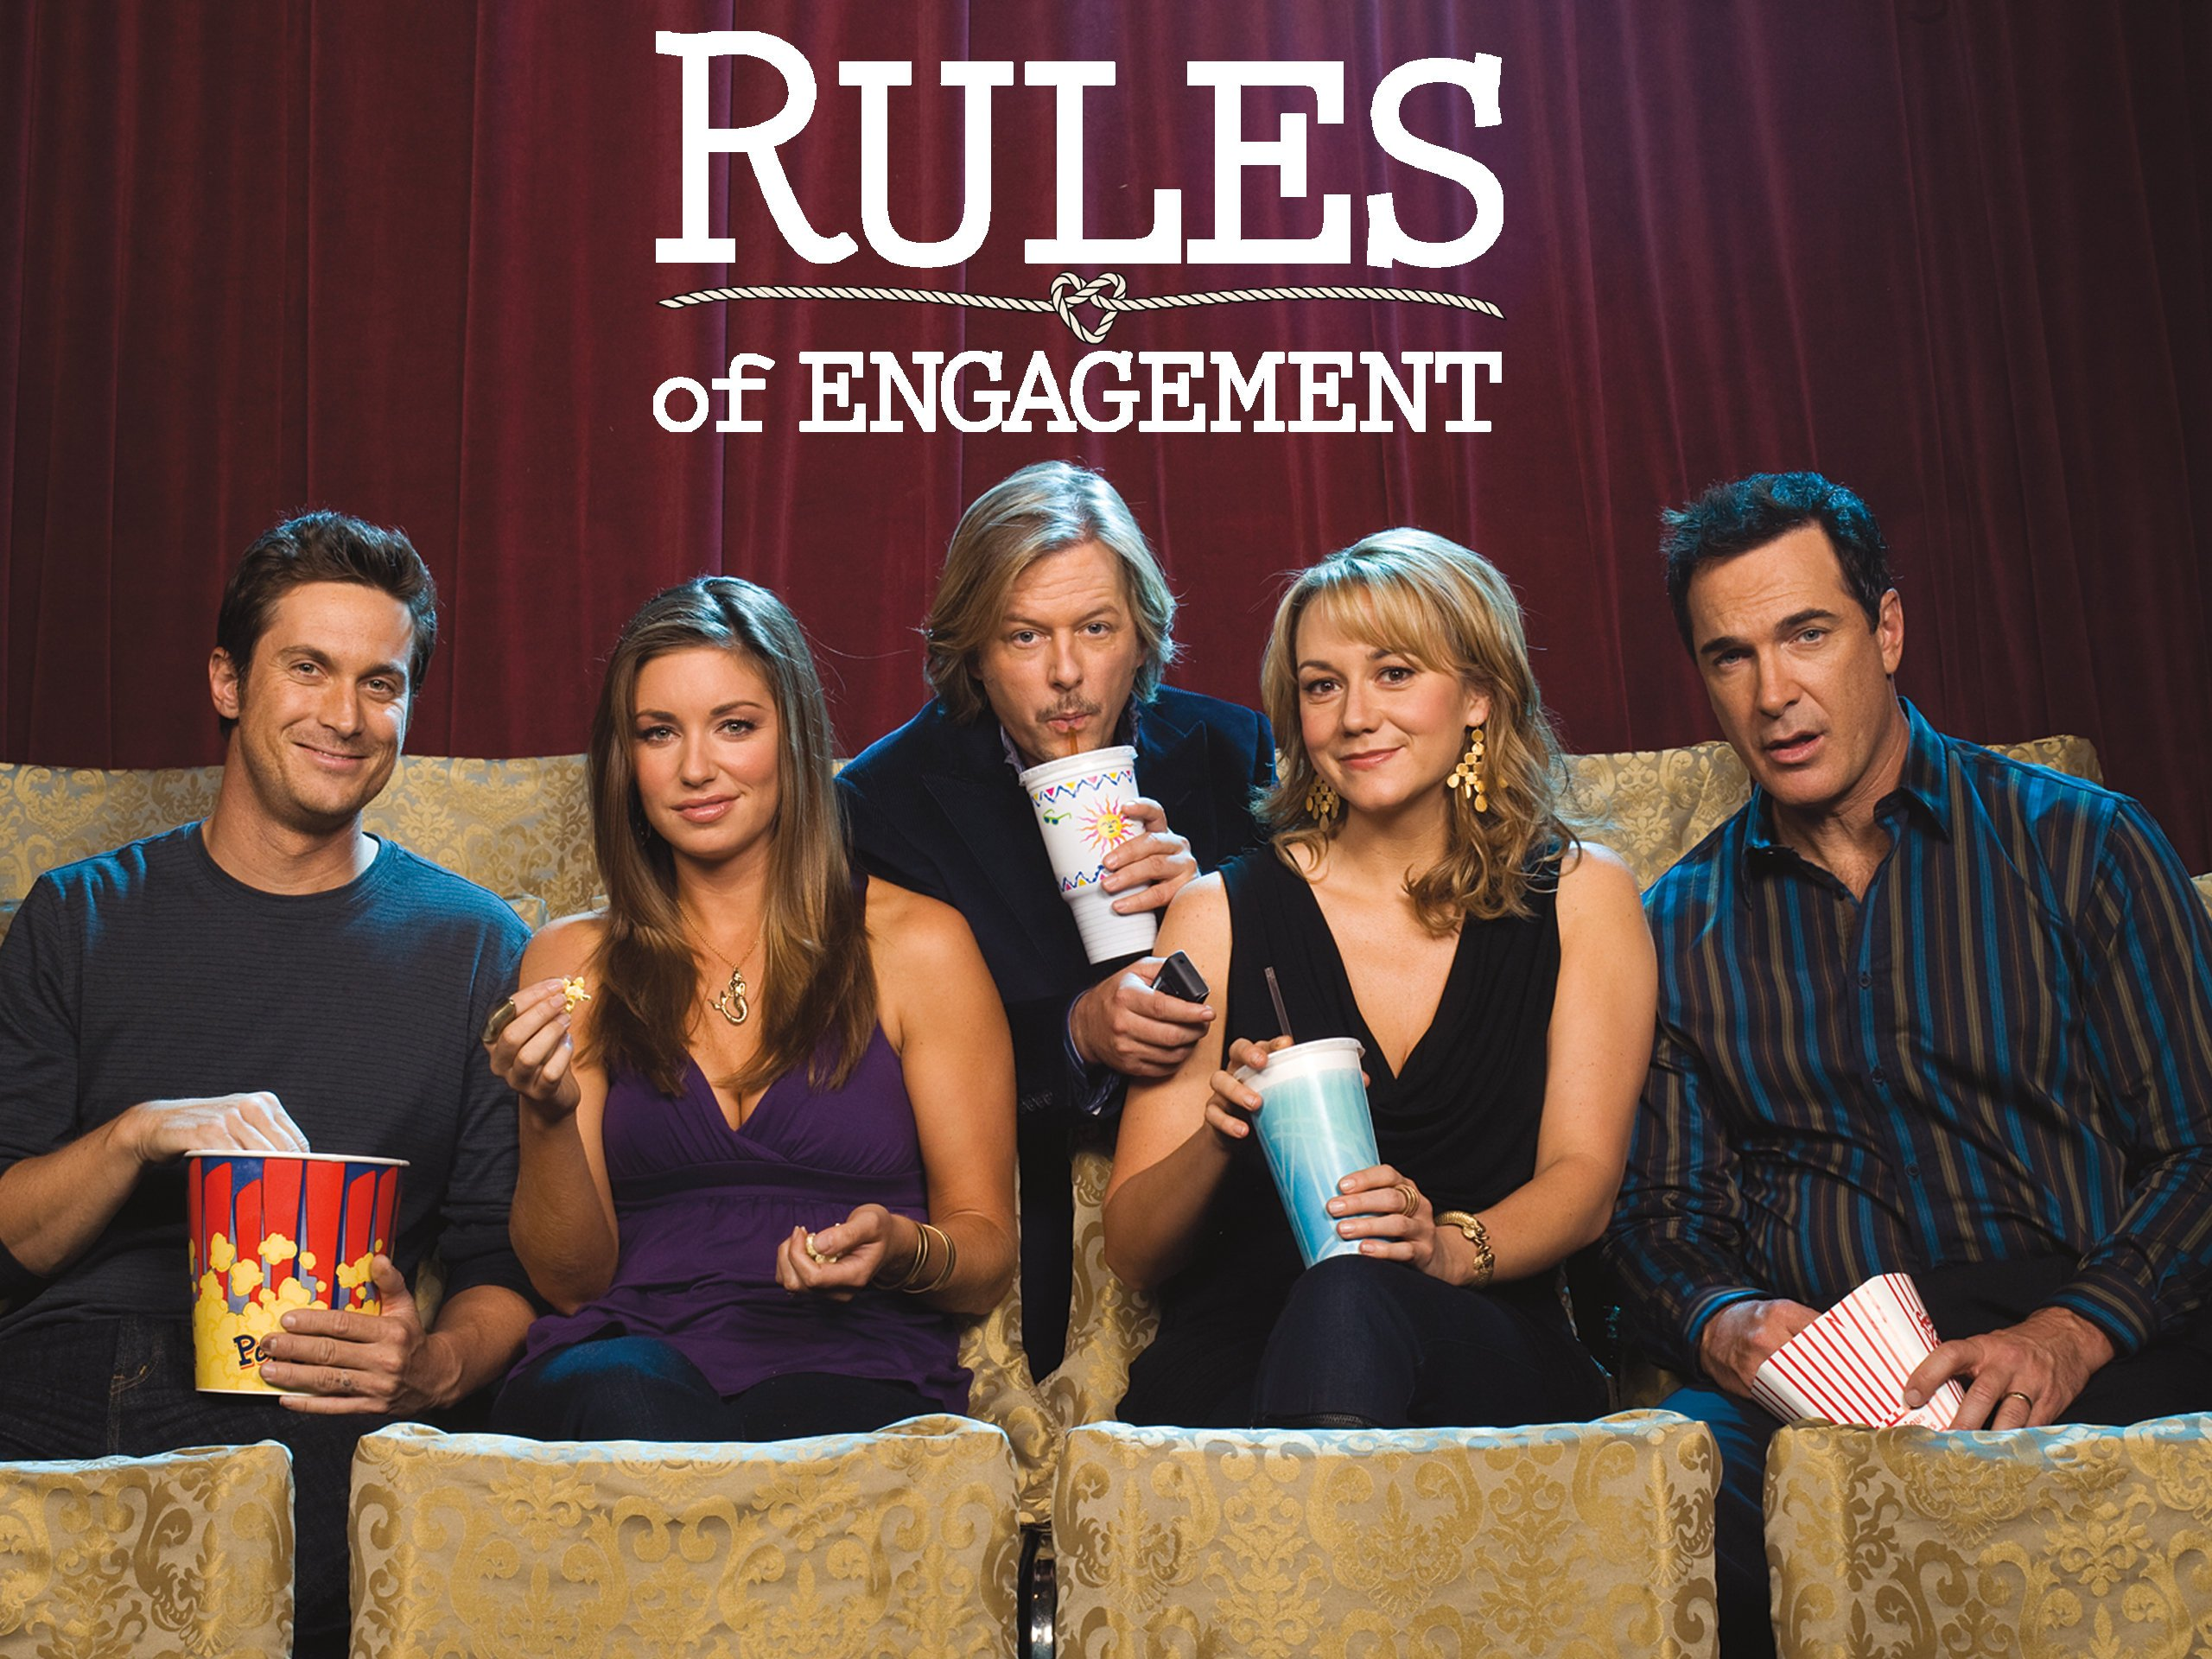 rules of engagement season 3 720p torrent